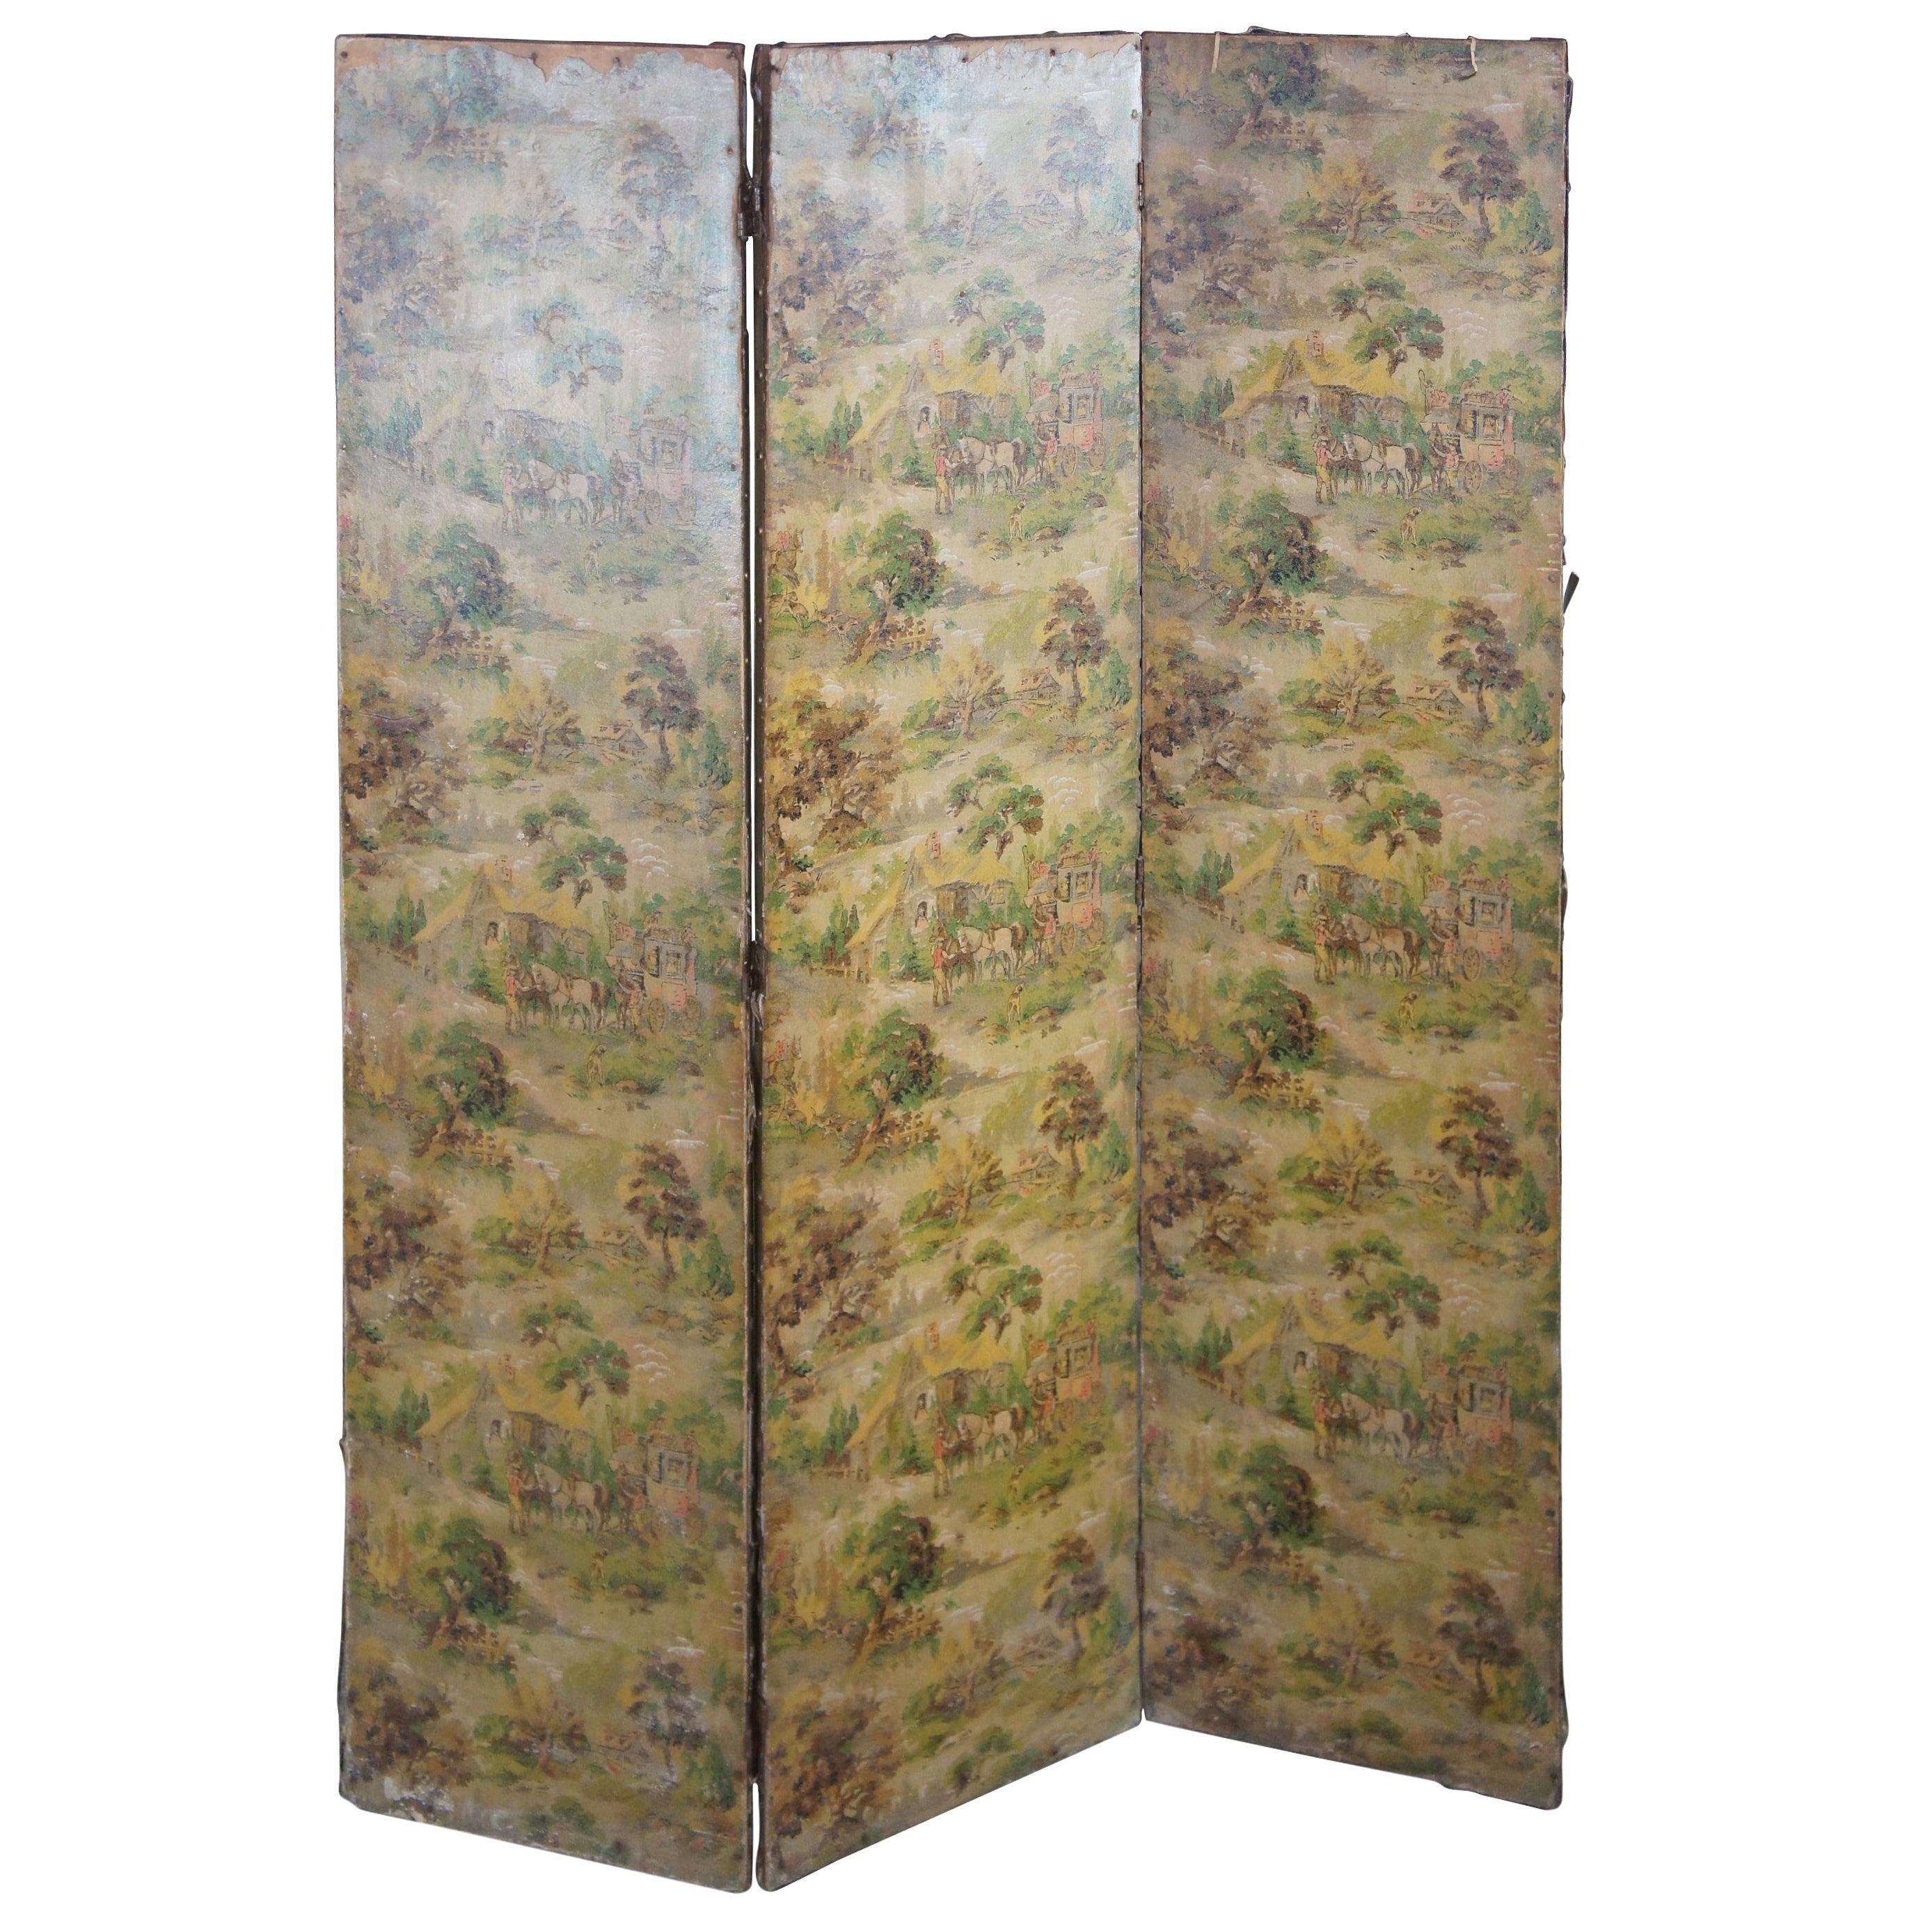 Antique 3-Panel Folding Screen Room Divider Victorian Landscape Lithograph Scene